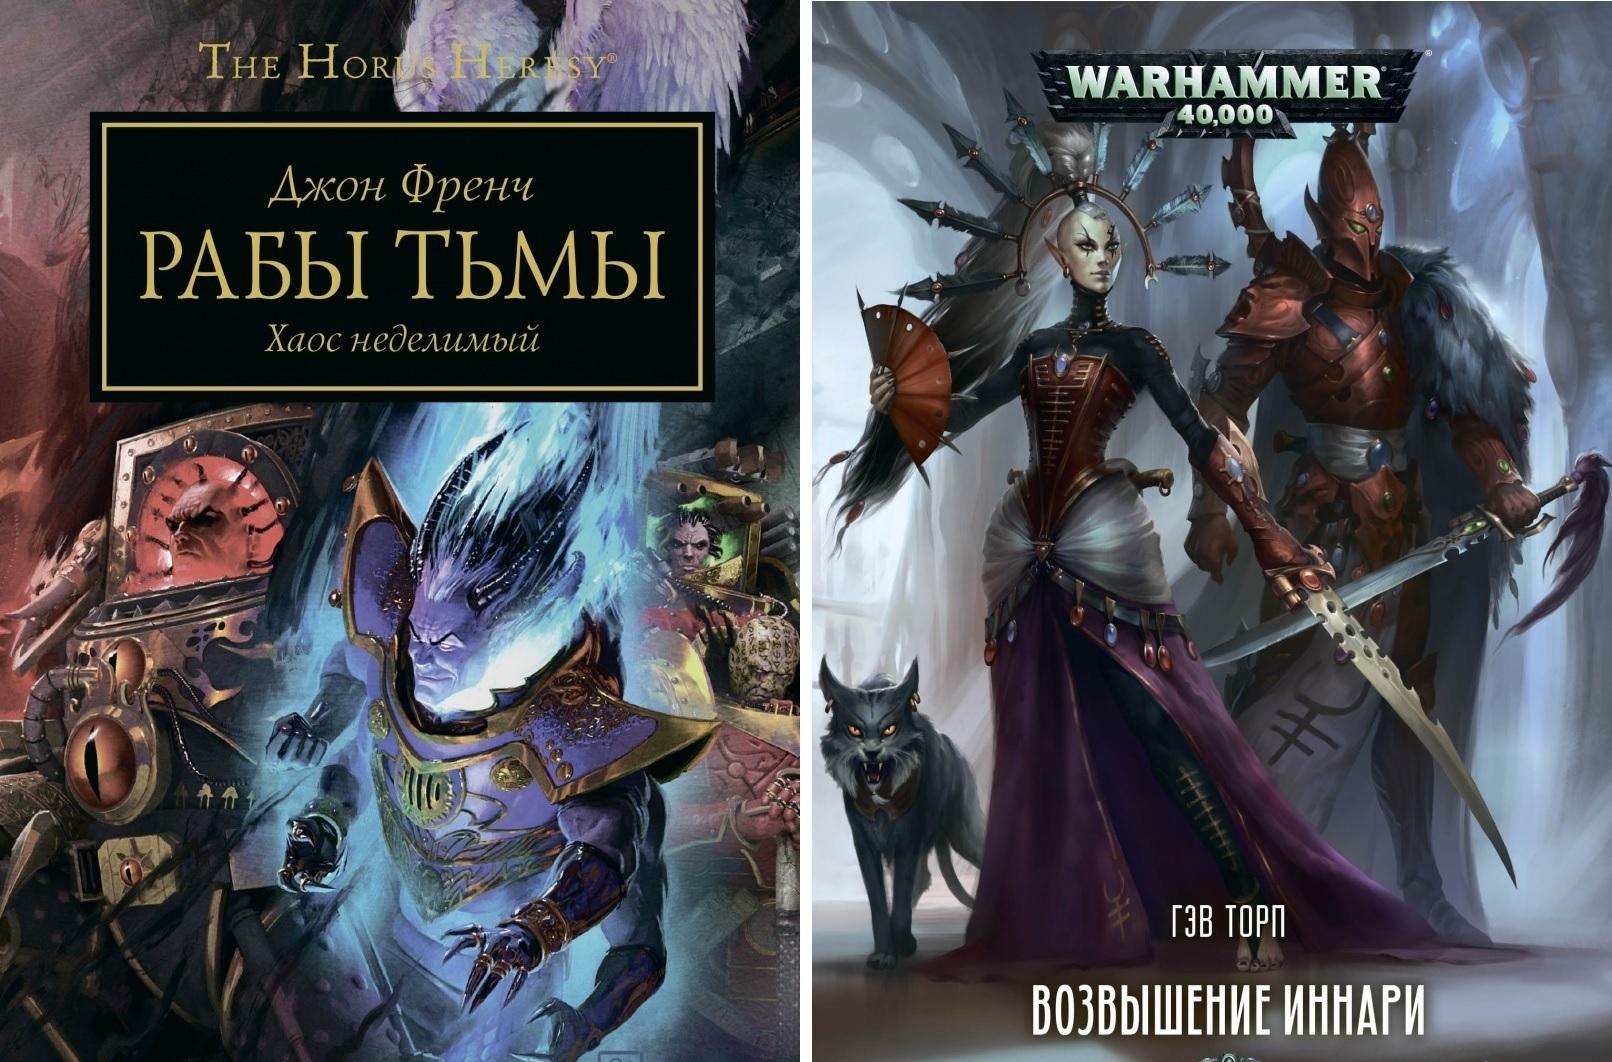 Сразу две новые книги по Warhammer